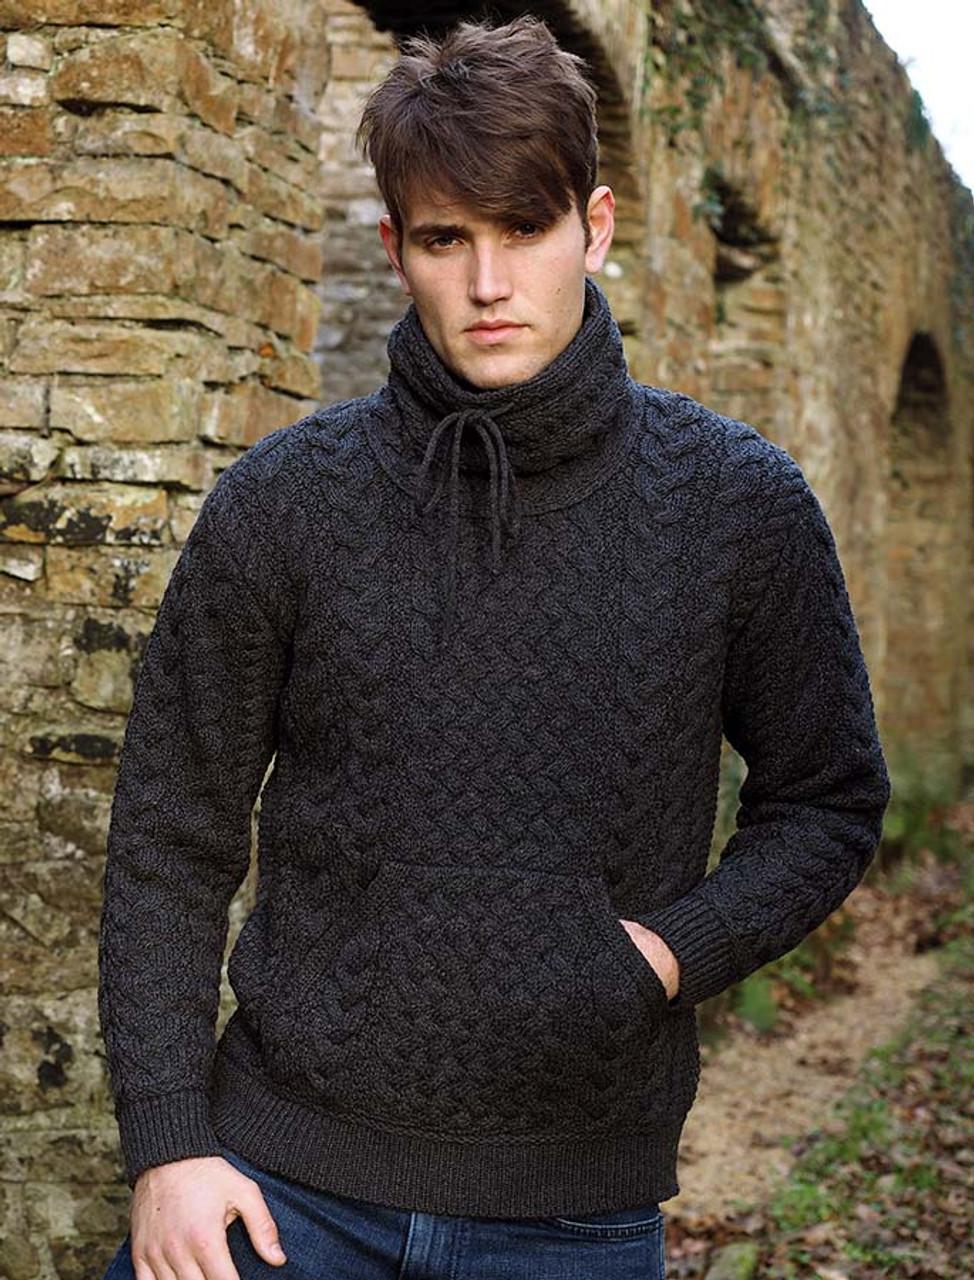 b3c0f26942 Men s Cowl Neck Aran Sweater - Charcoal